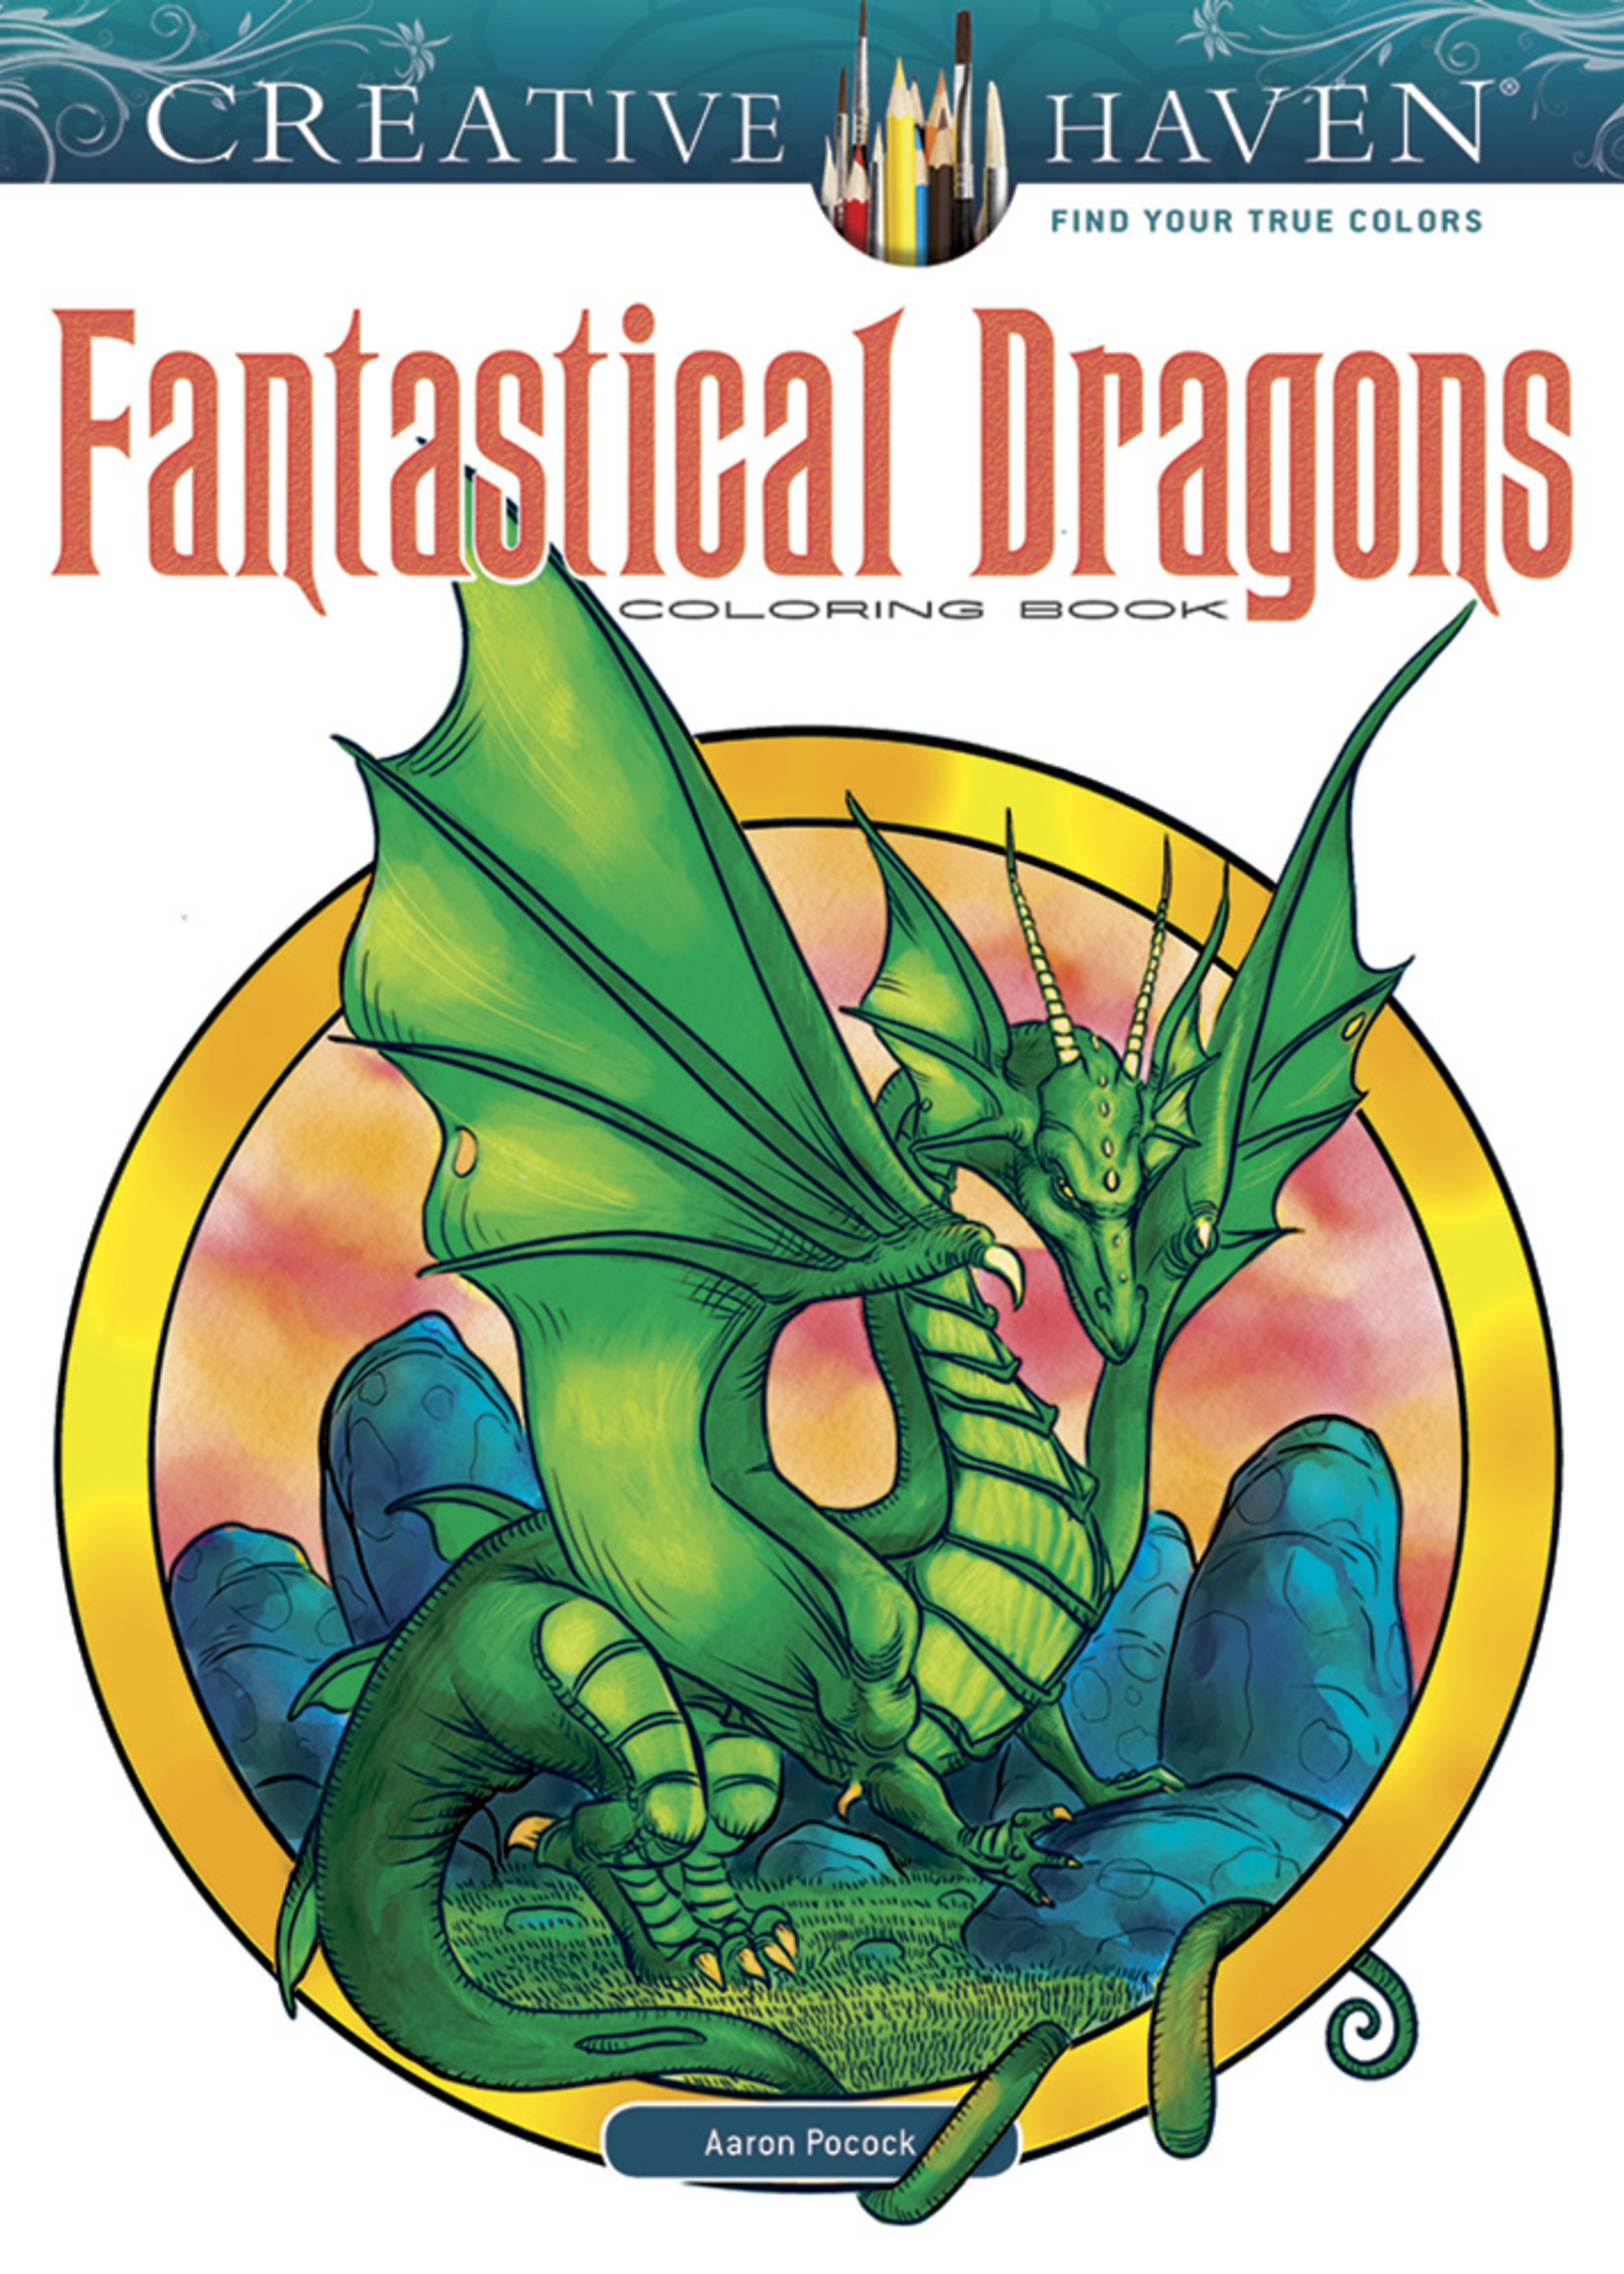 Creative Haven Fantastical Dragons Coloring Book - Paperback